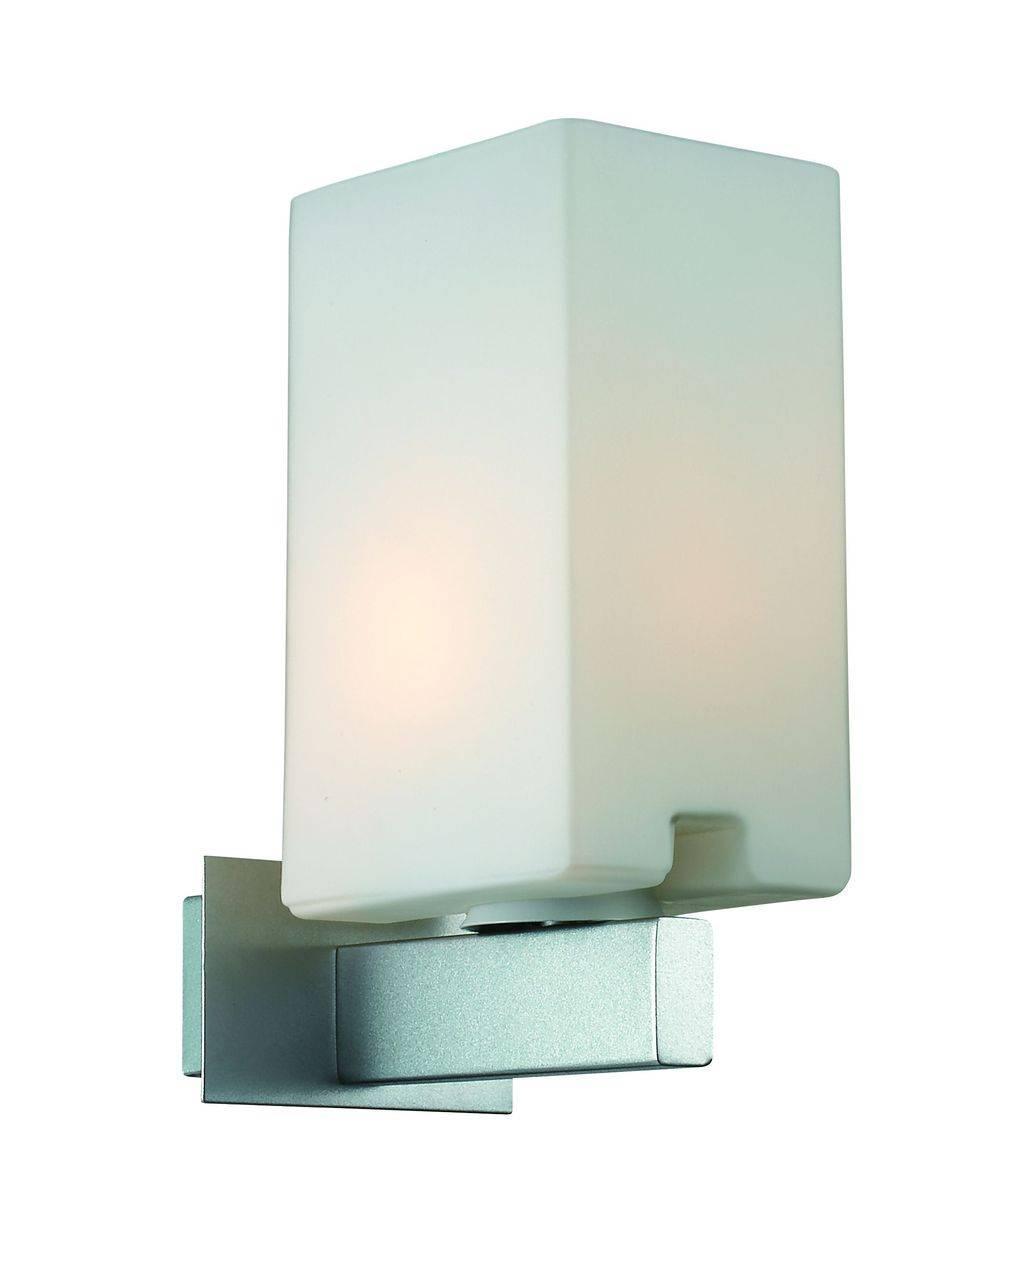 Бра ST Luce Caset SL541.101.01 бра st luce caset sl541 101 01